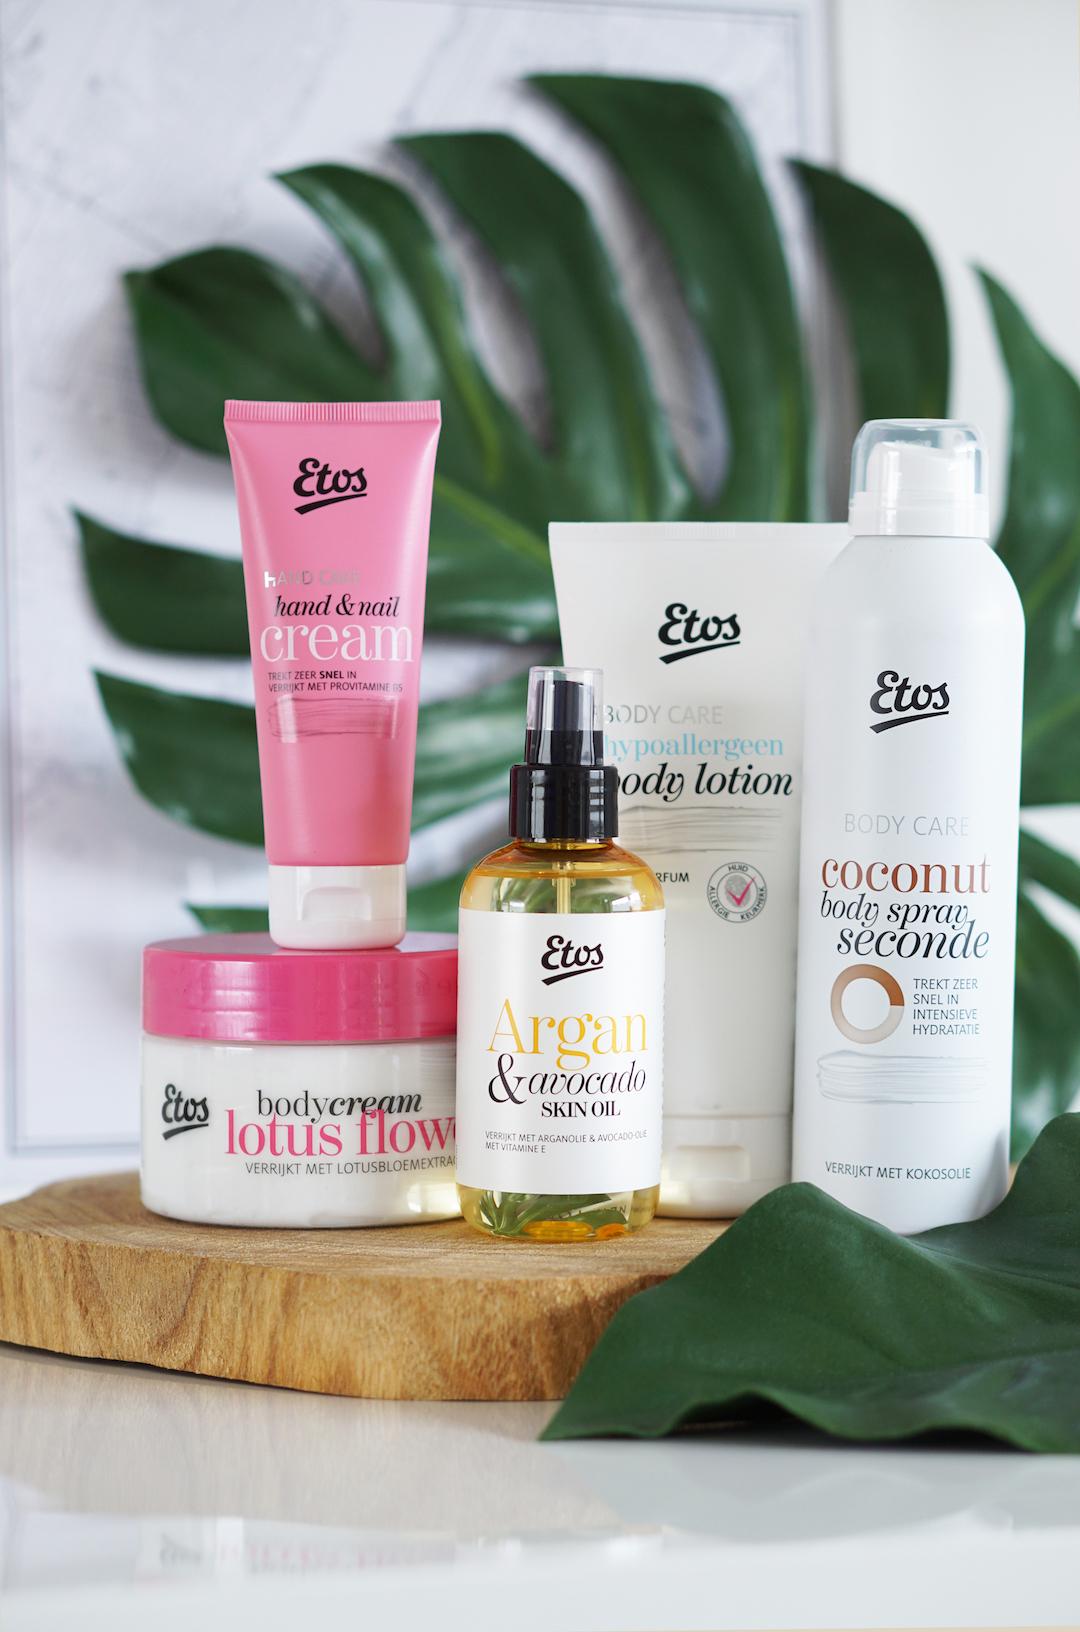 Etos bodyproducten & skin oils